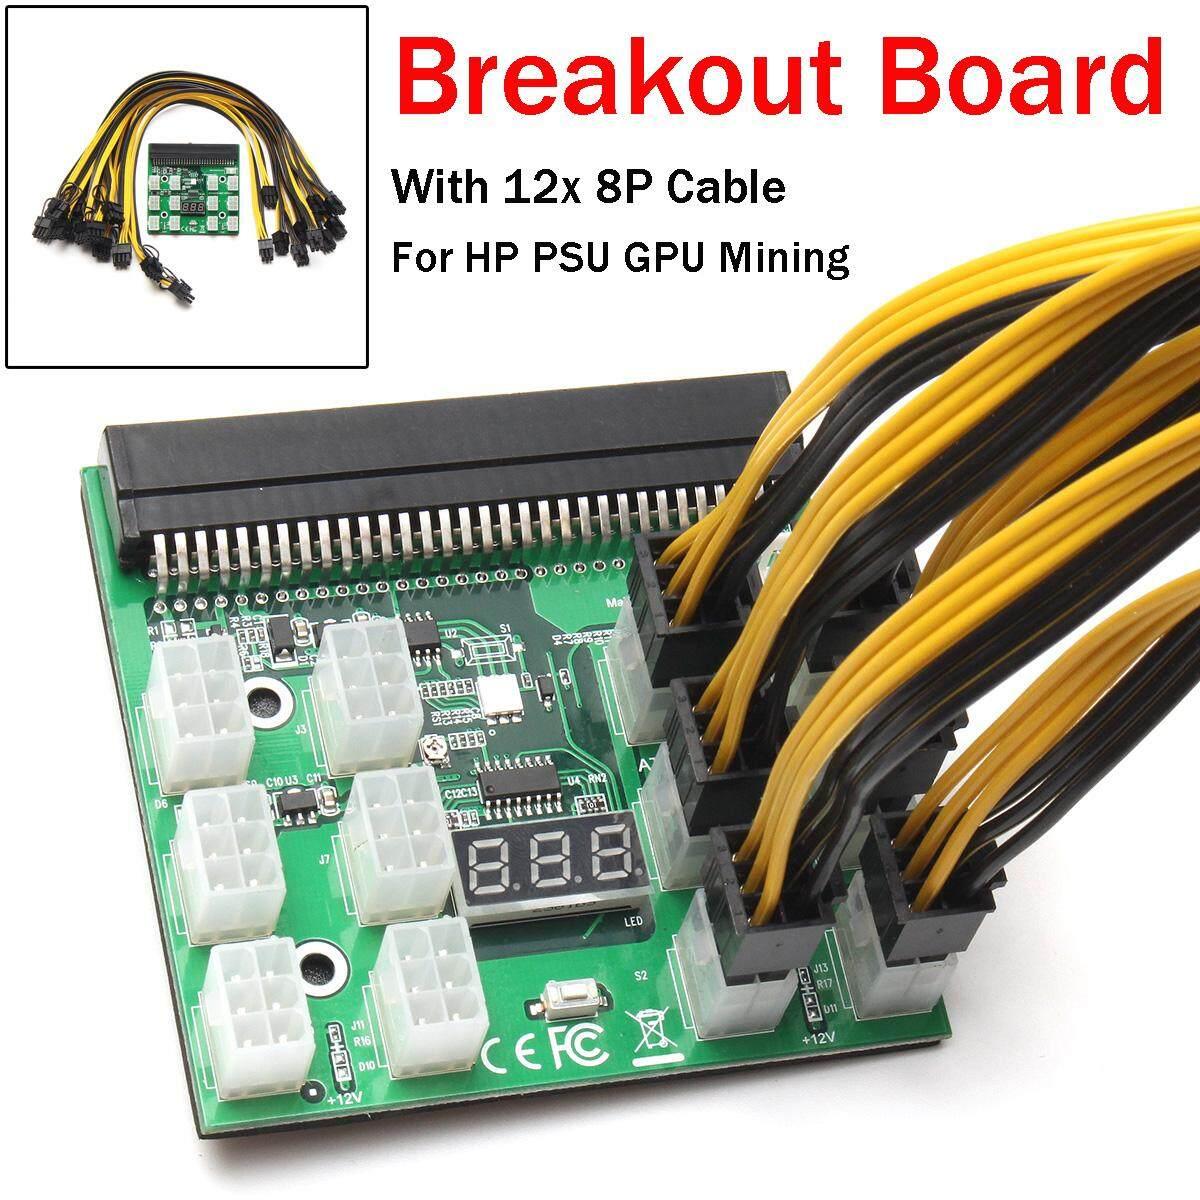 1200 W Breakout Babi Hutan W/Tombol untuk HP PSU GPU Pertambangan Ethereum + 12X8 P Kabel- internasional